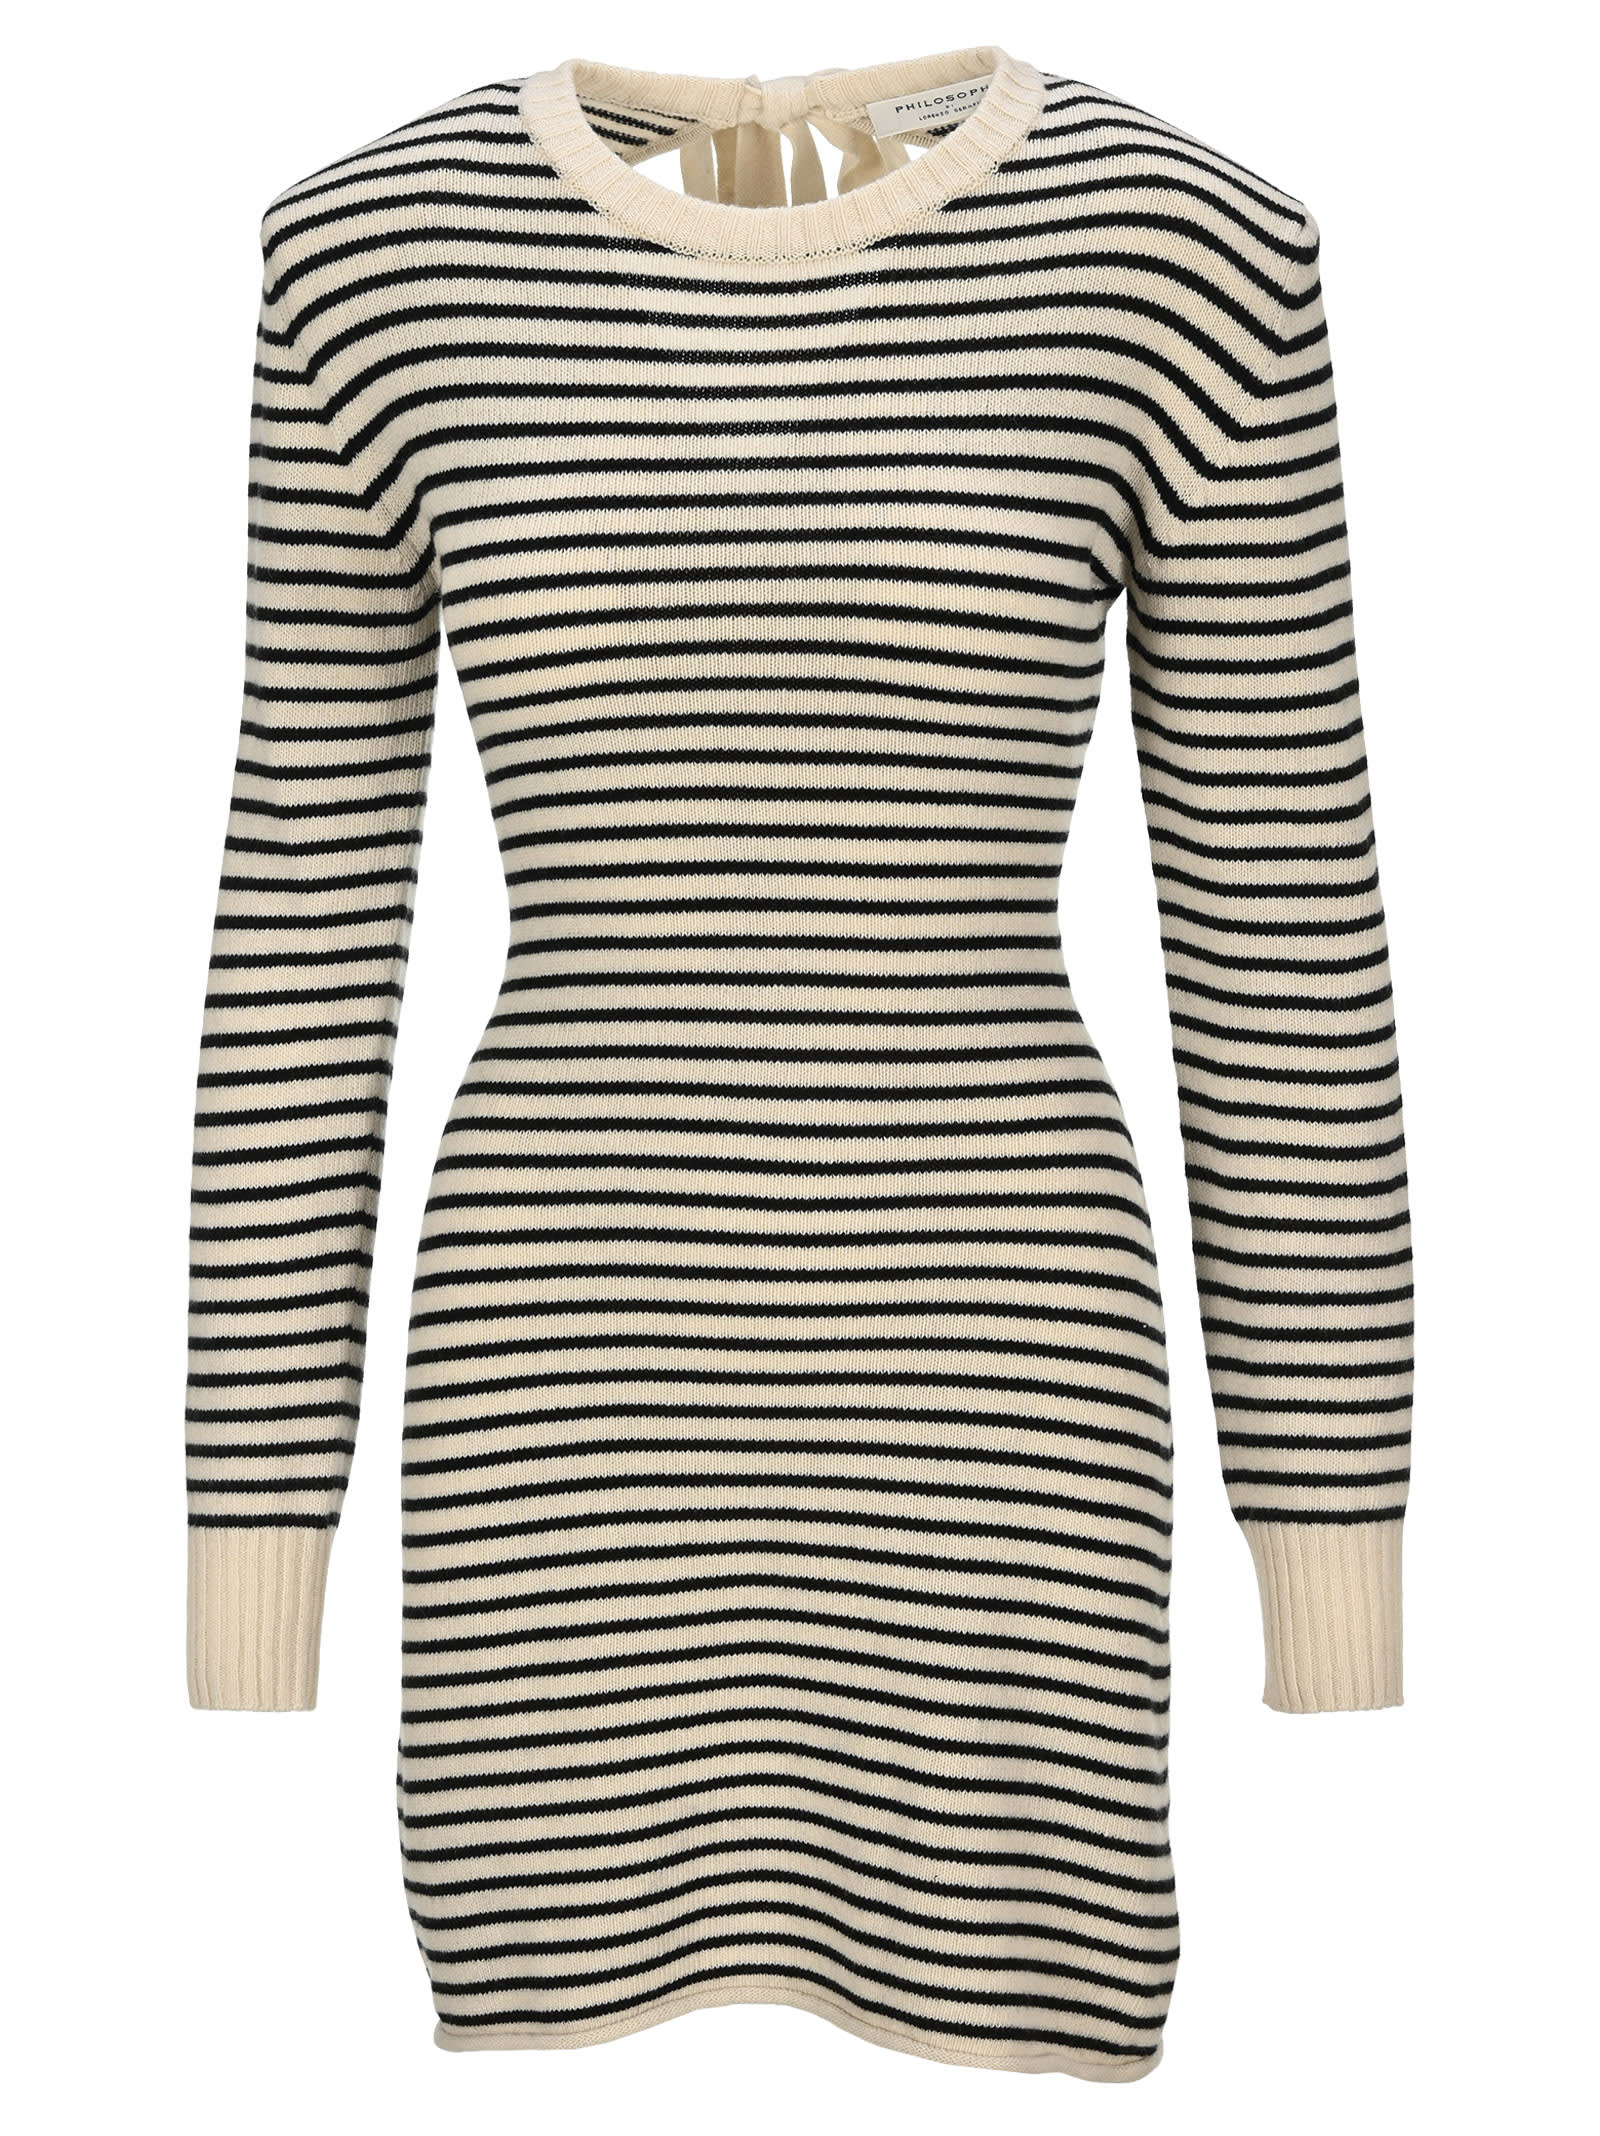 Philosophy Striped Knit Dress